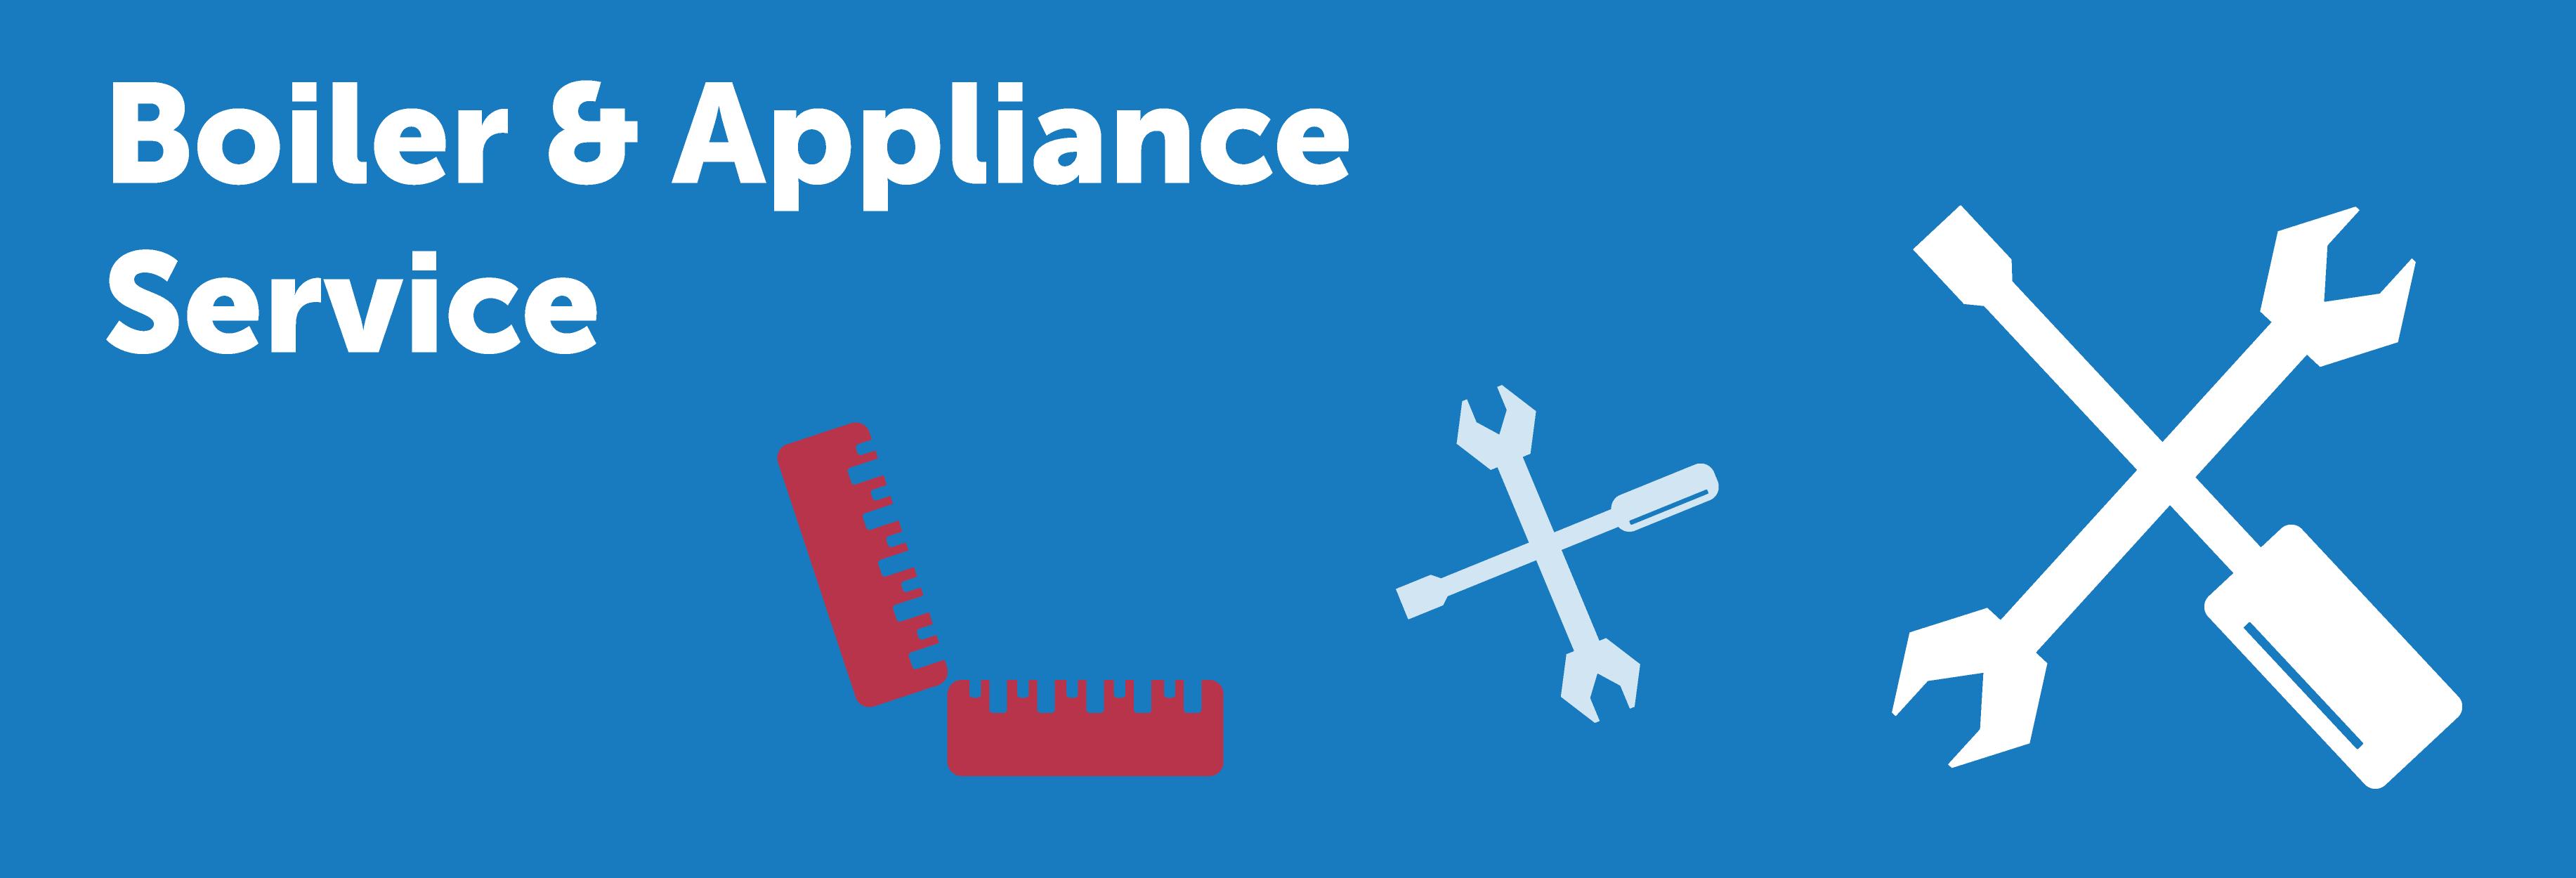 Boiler Service & Appliance Service Banner